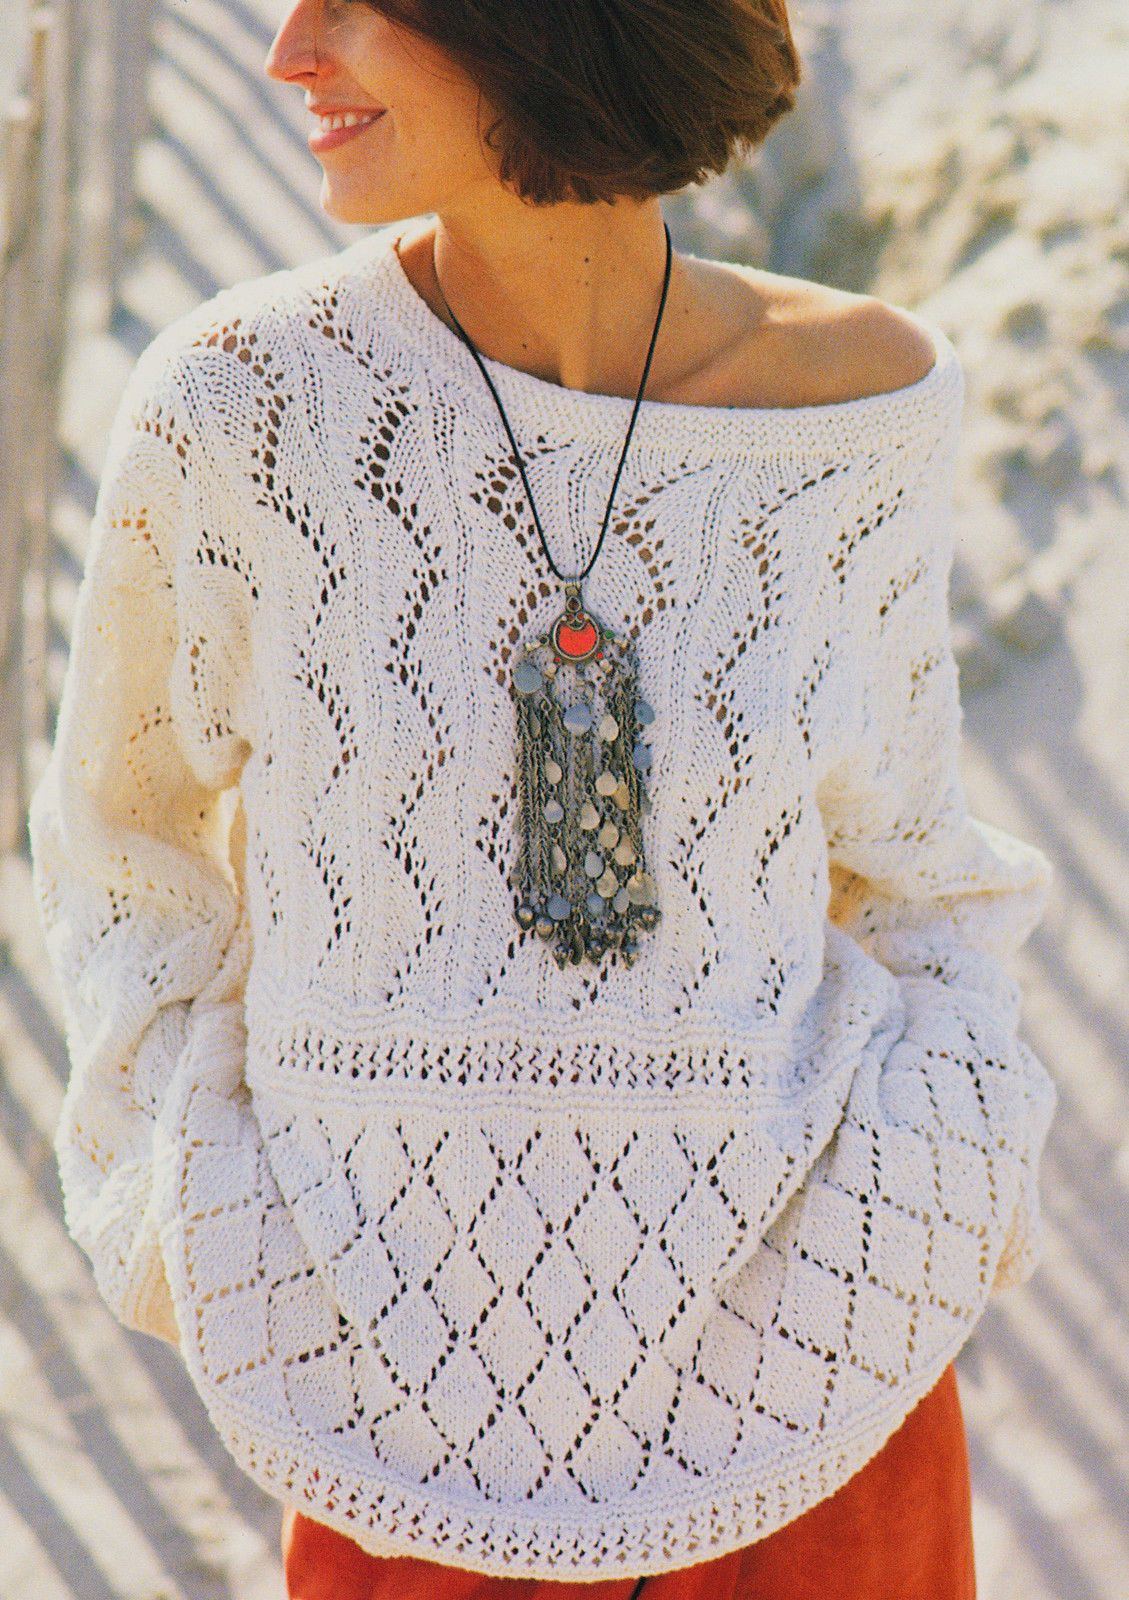 Lace Sampler Summer Sweater Knitting Pattern S-M-L in DK Cotton/Silk ...